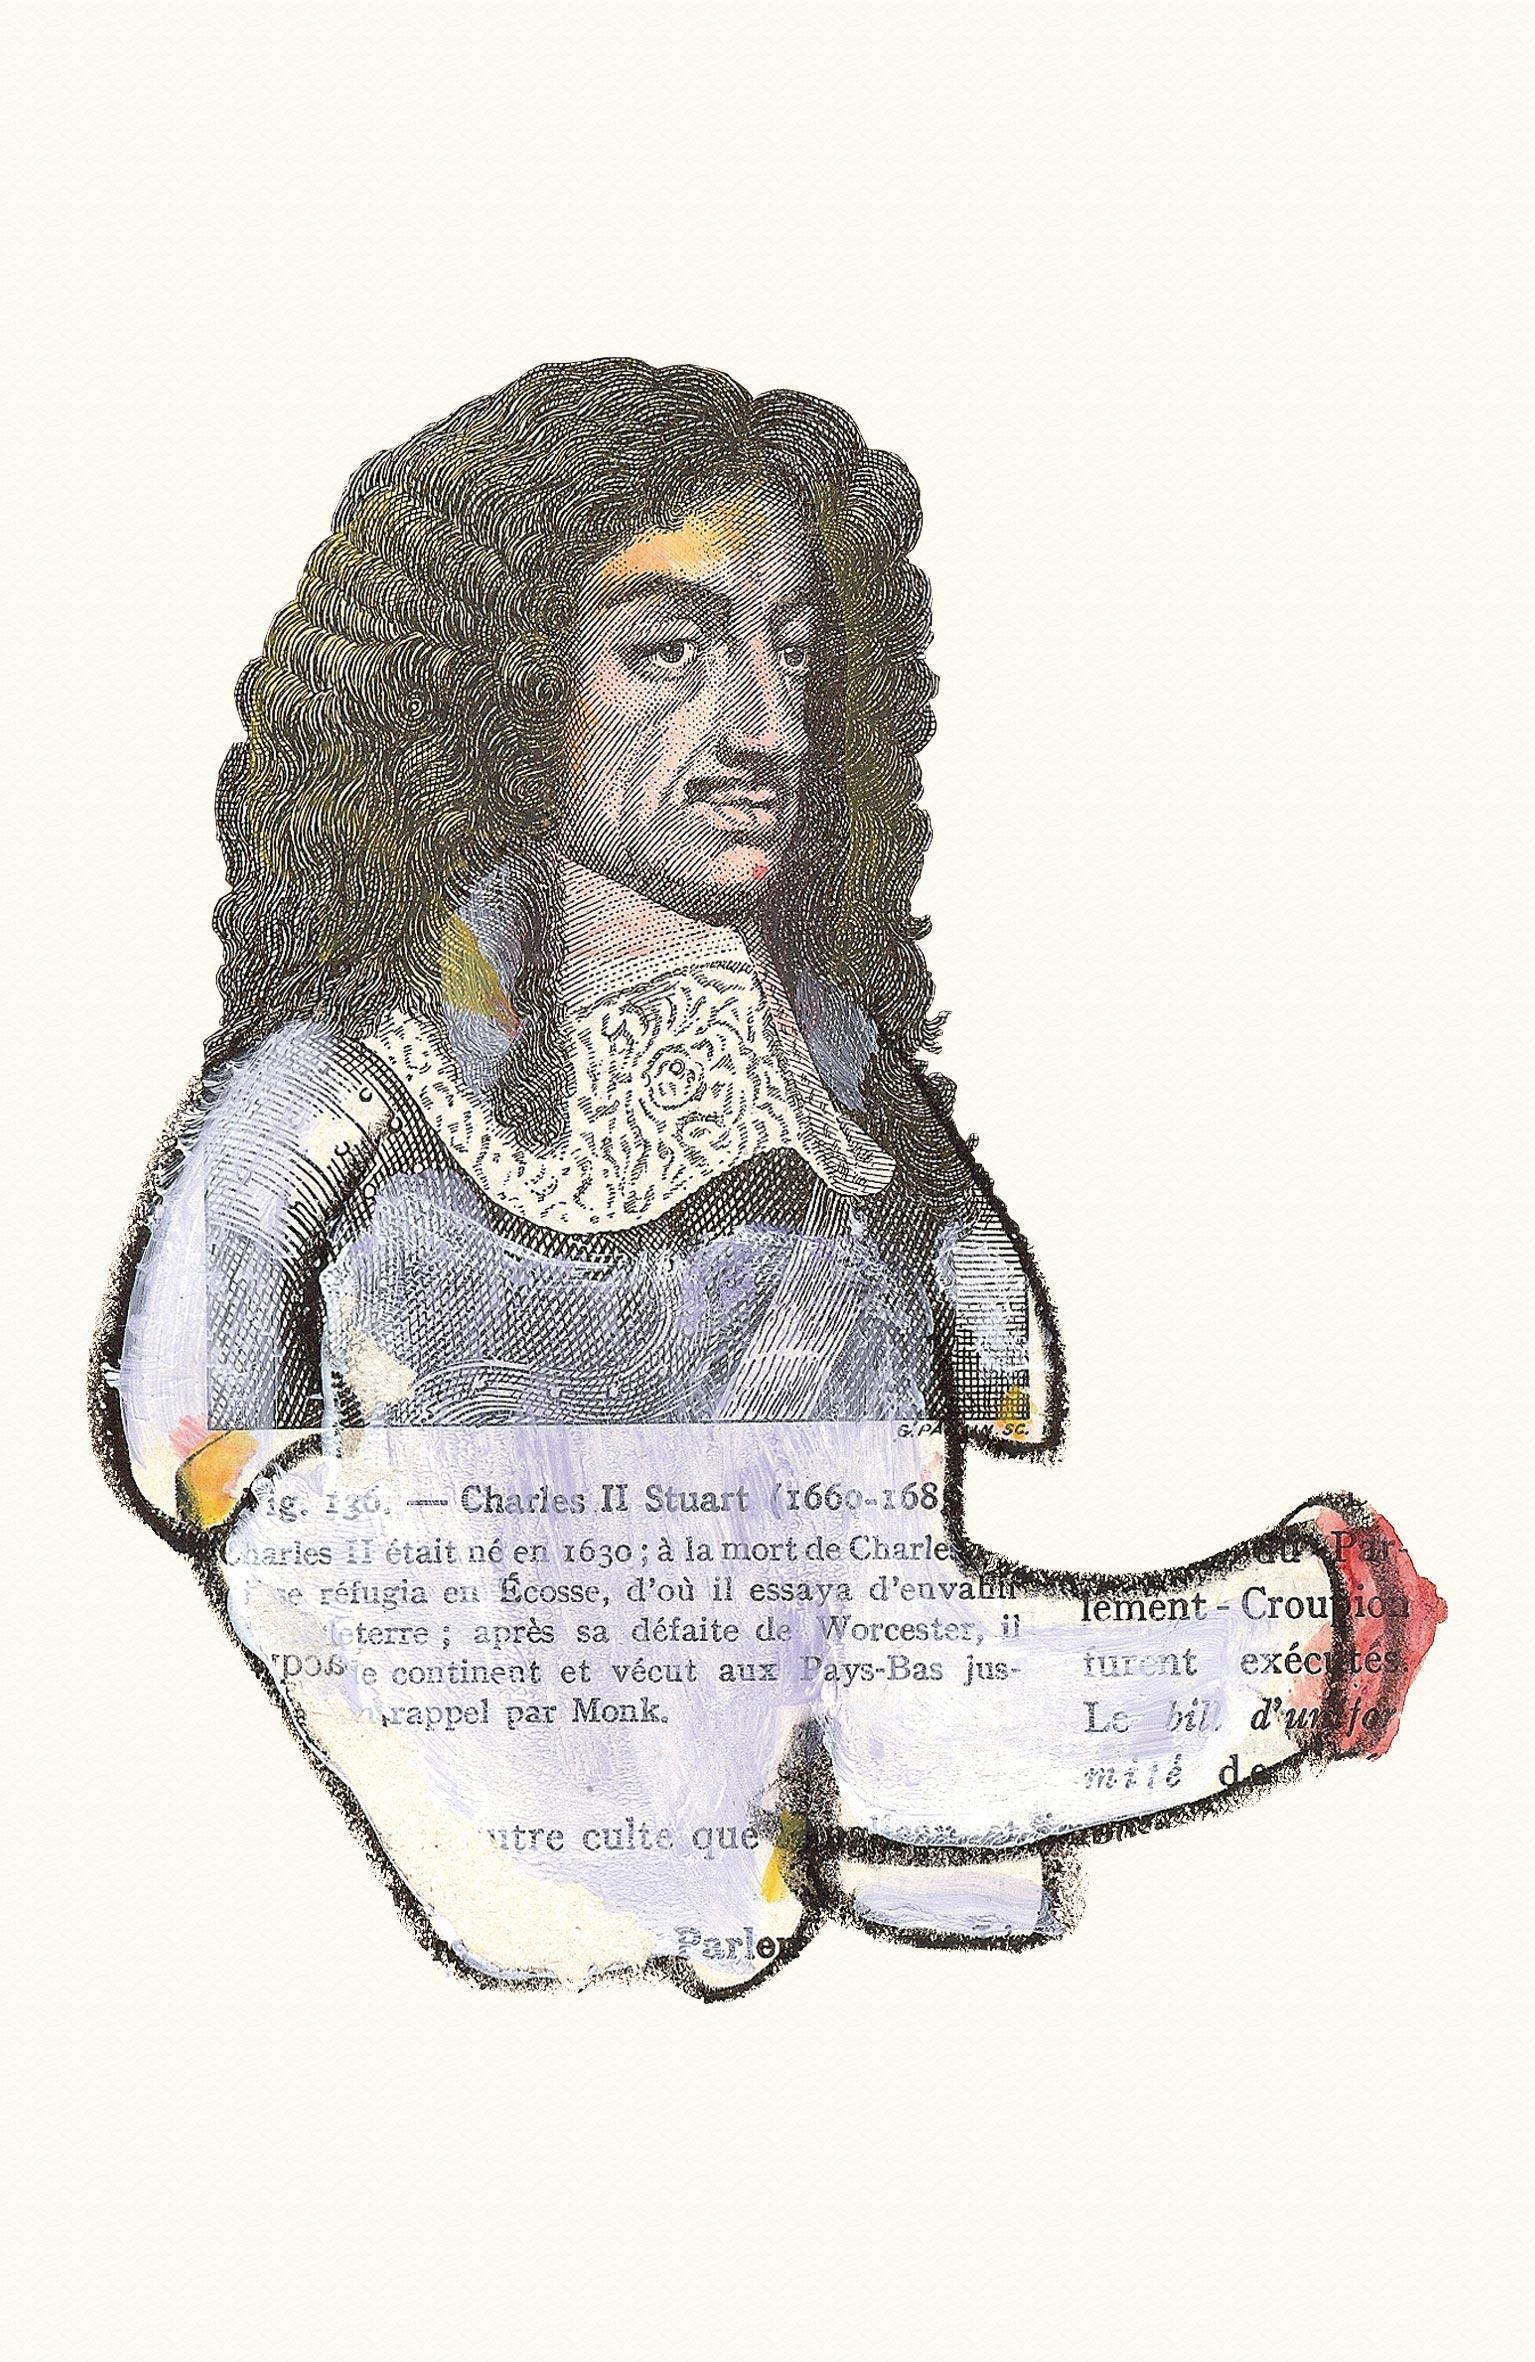 Karlo II, kralj Engleske (1630-1685)